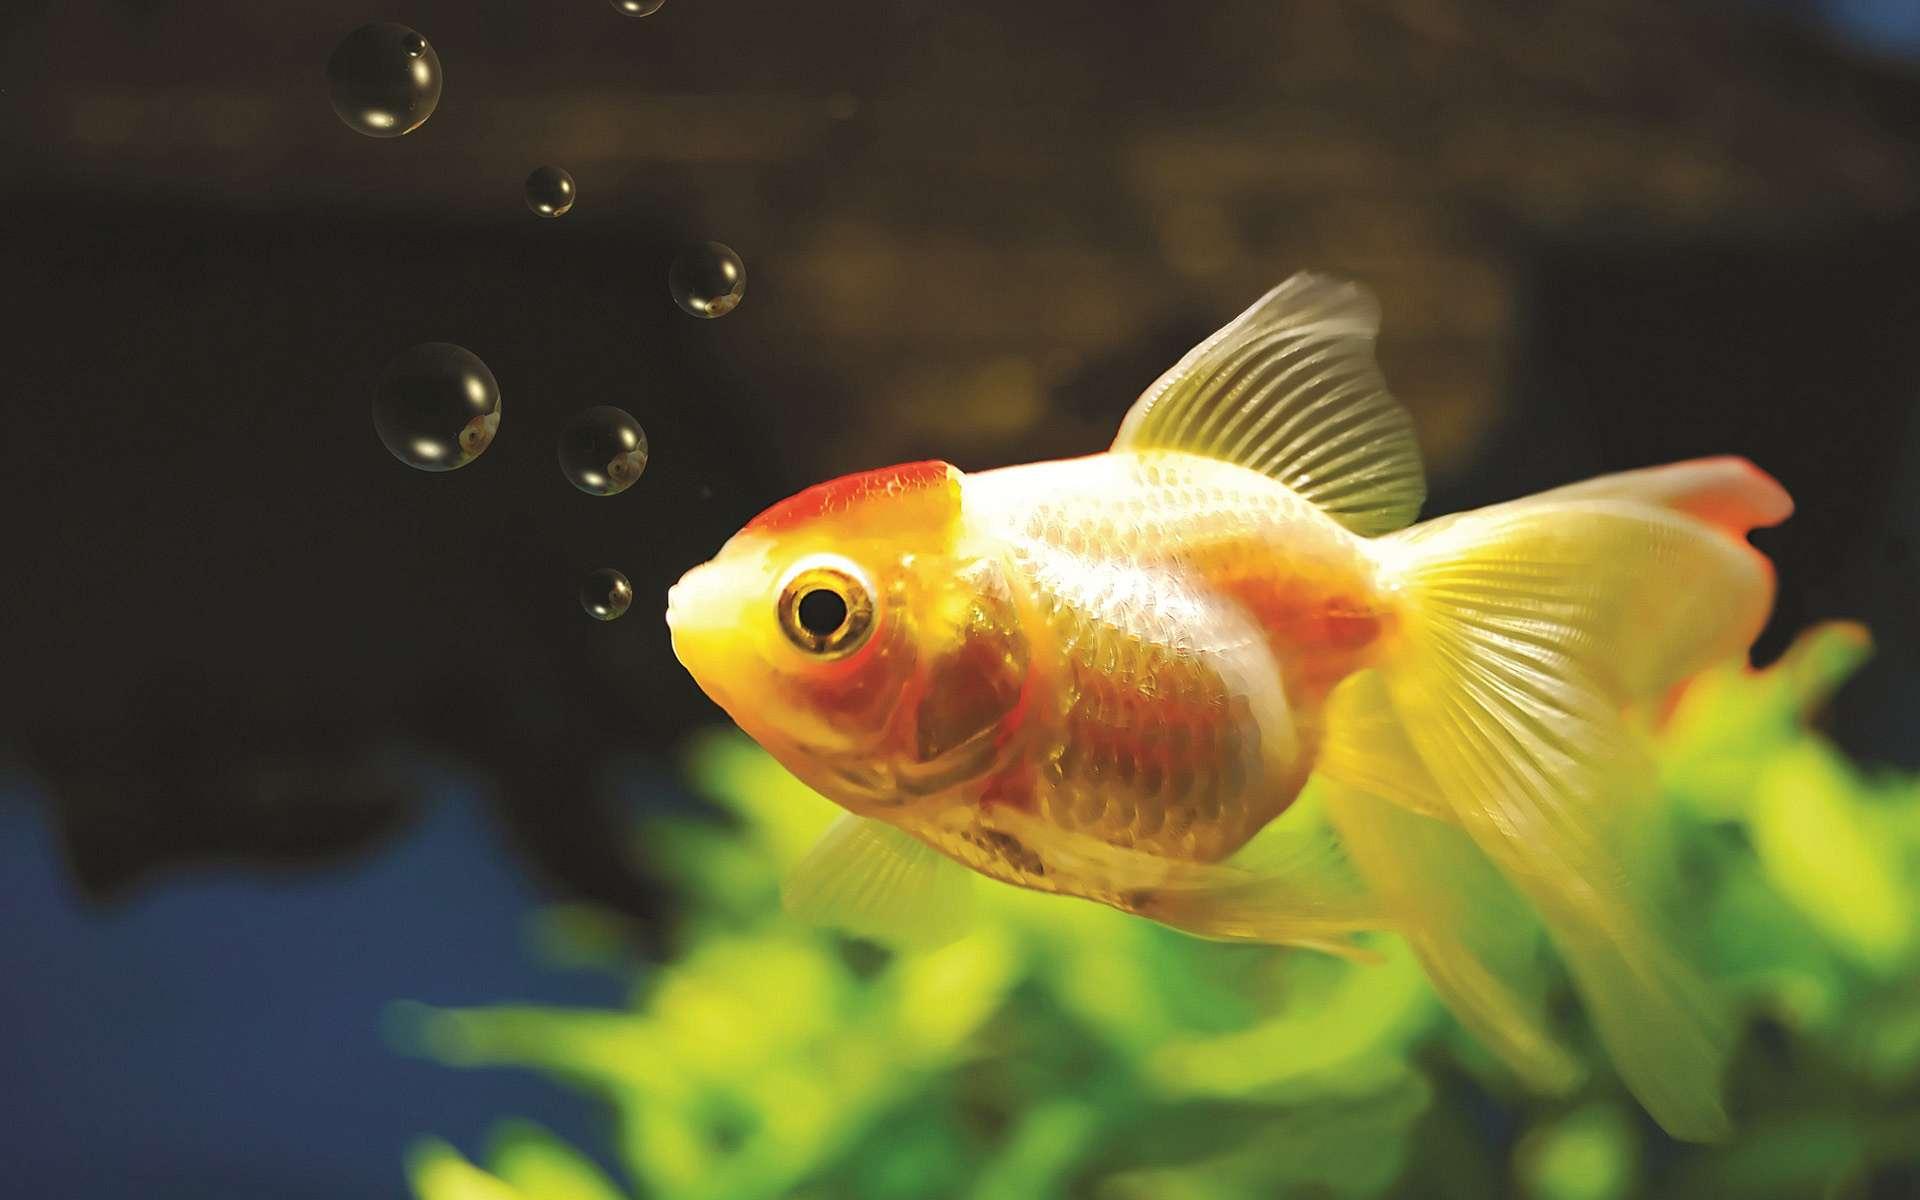 Bandai Releases Underwater Submarine For Goldfish